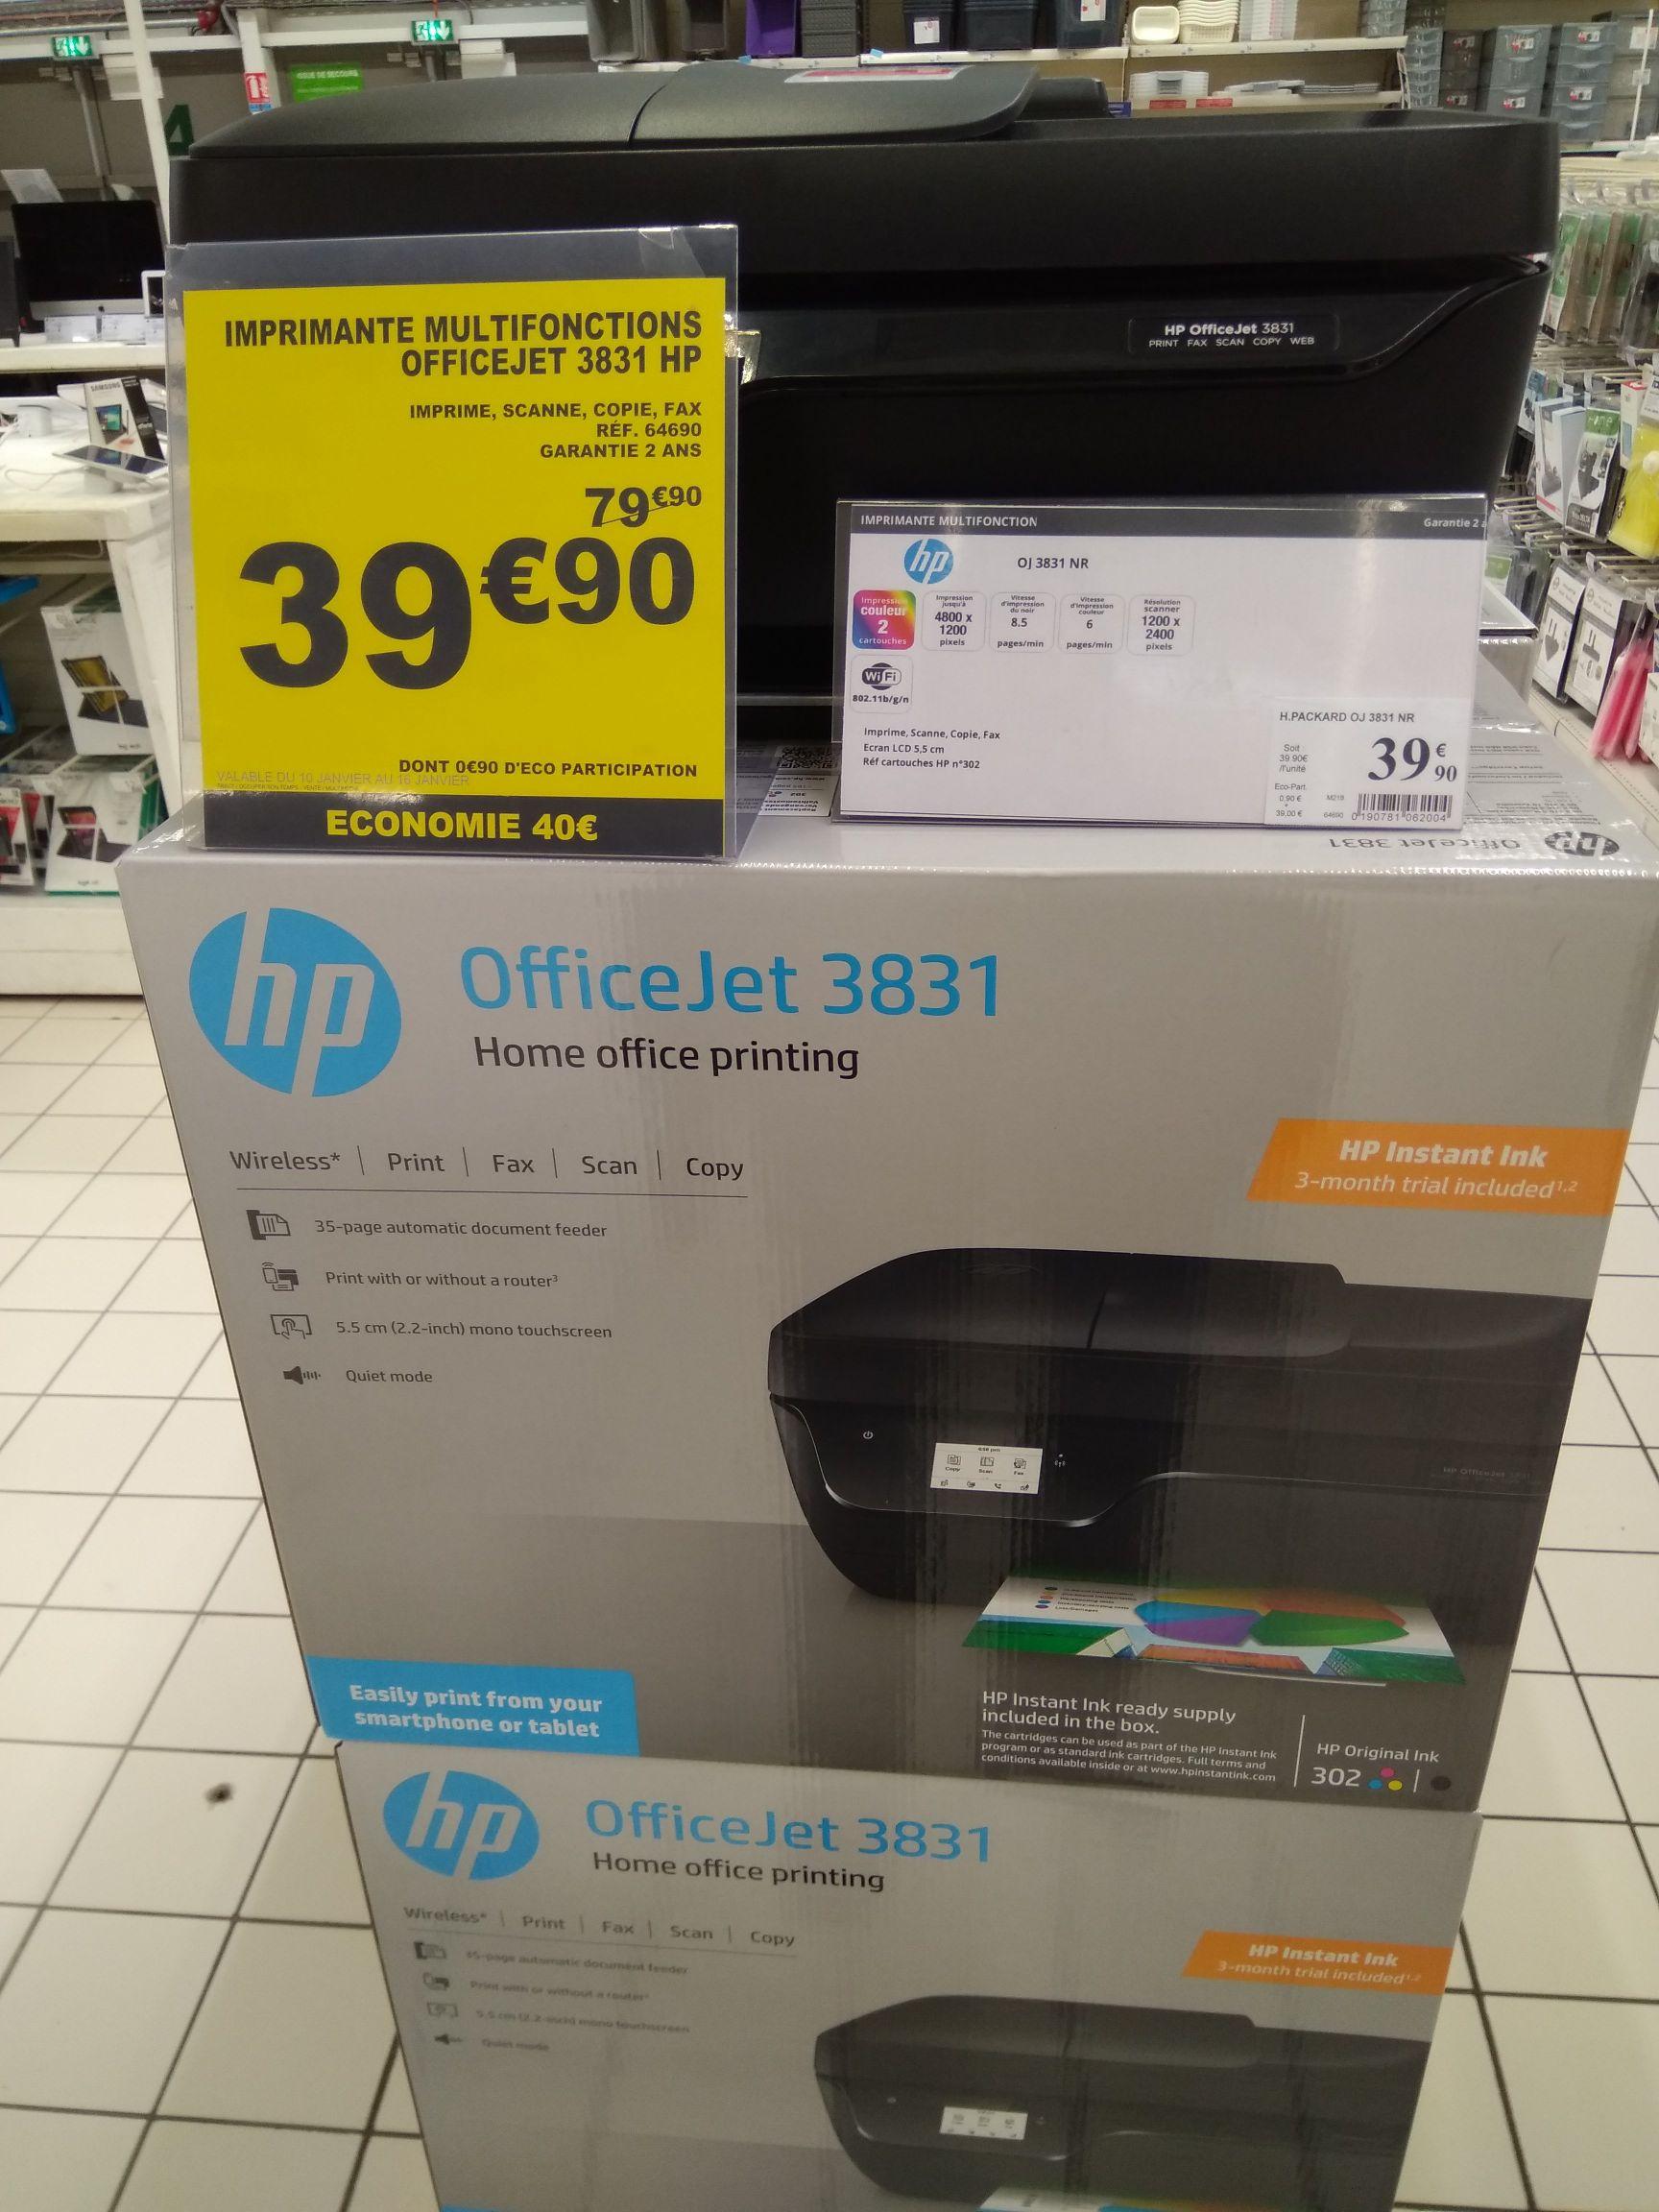 Imprimante jet d'encre HP OfficeJet 3831 - 3 mois InstantInk offerts - Osny (95)